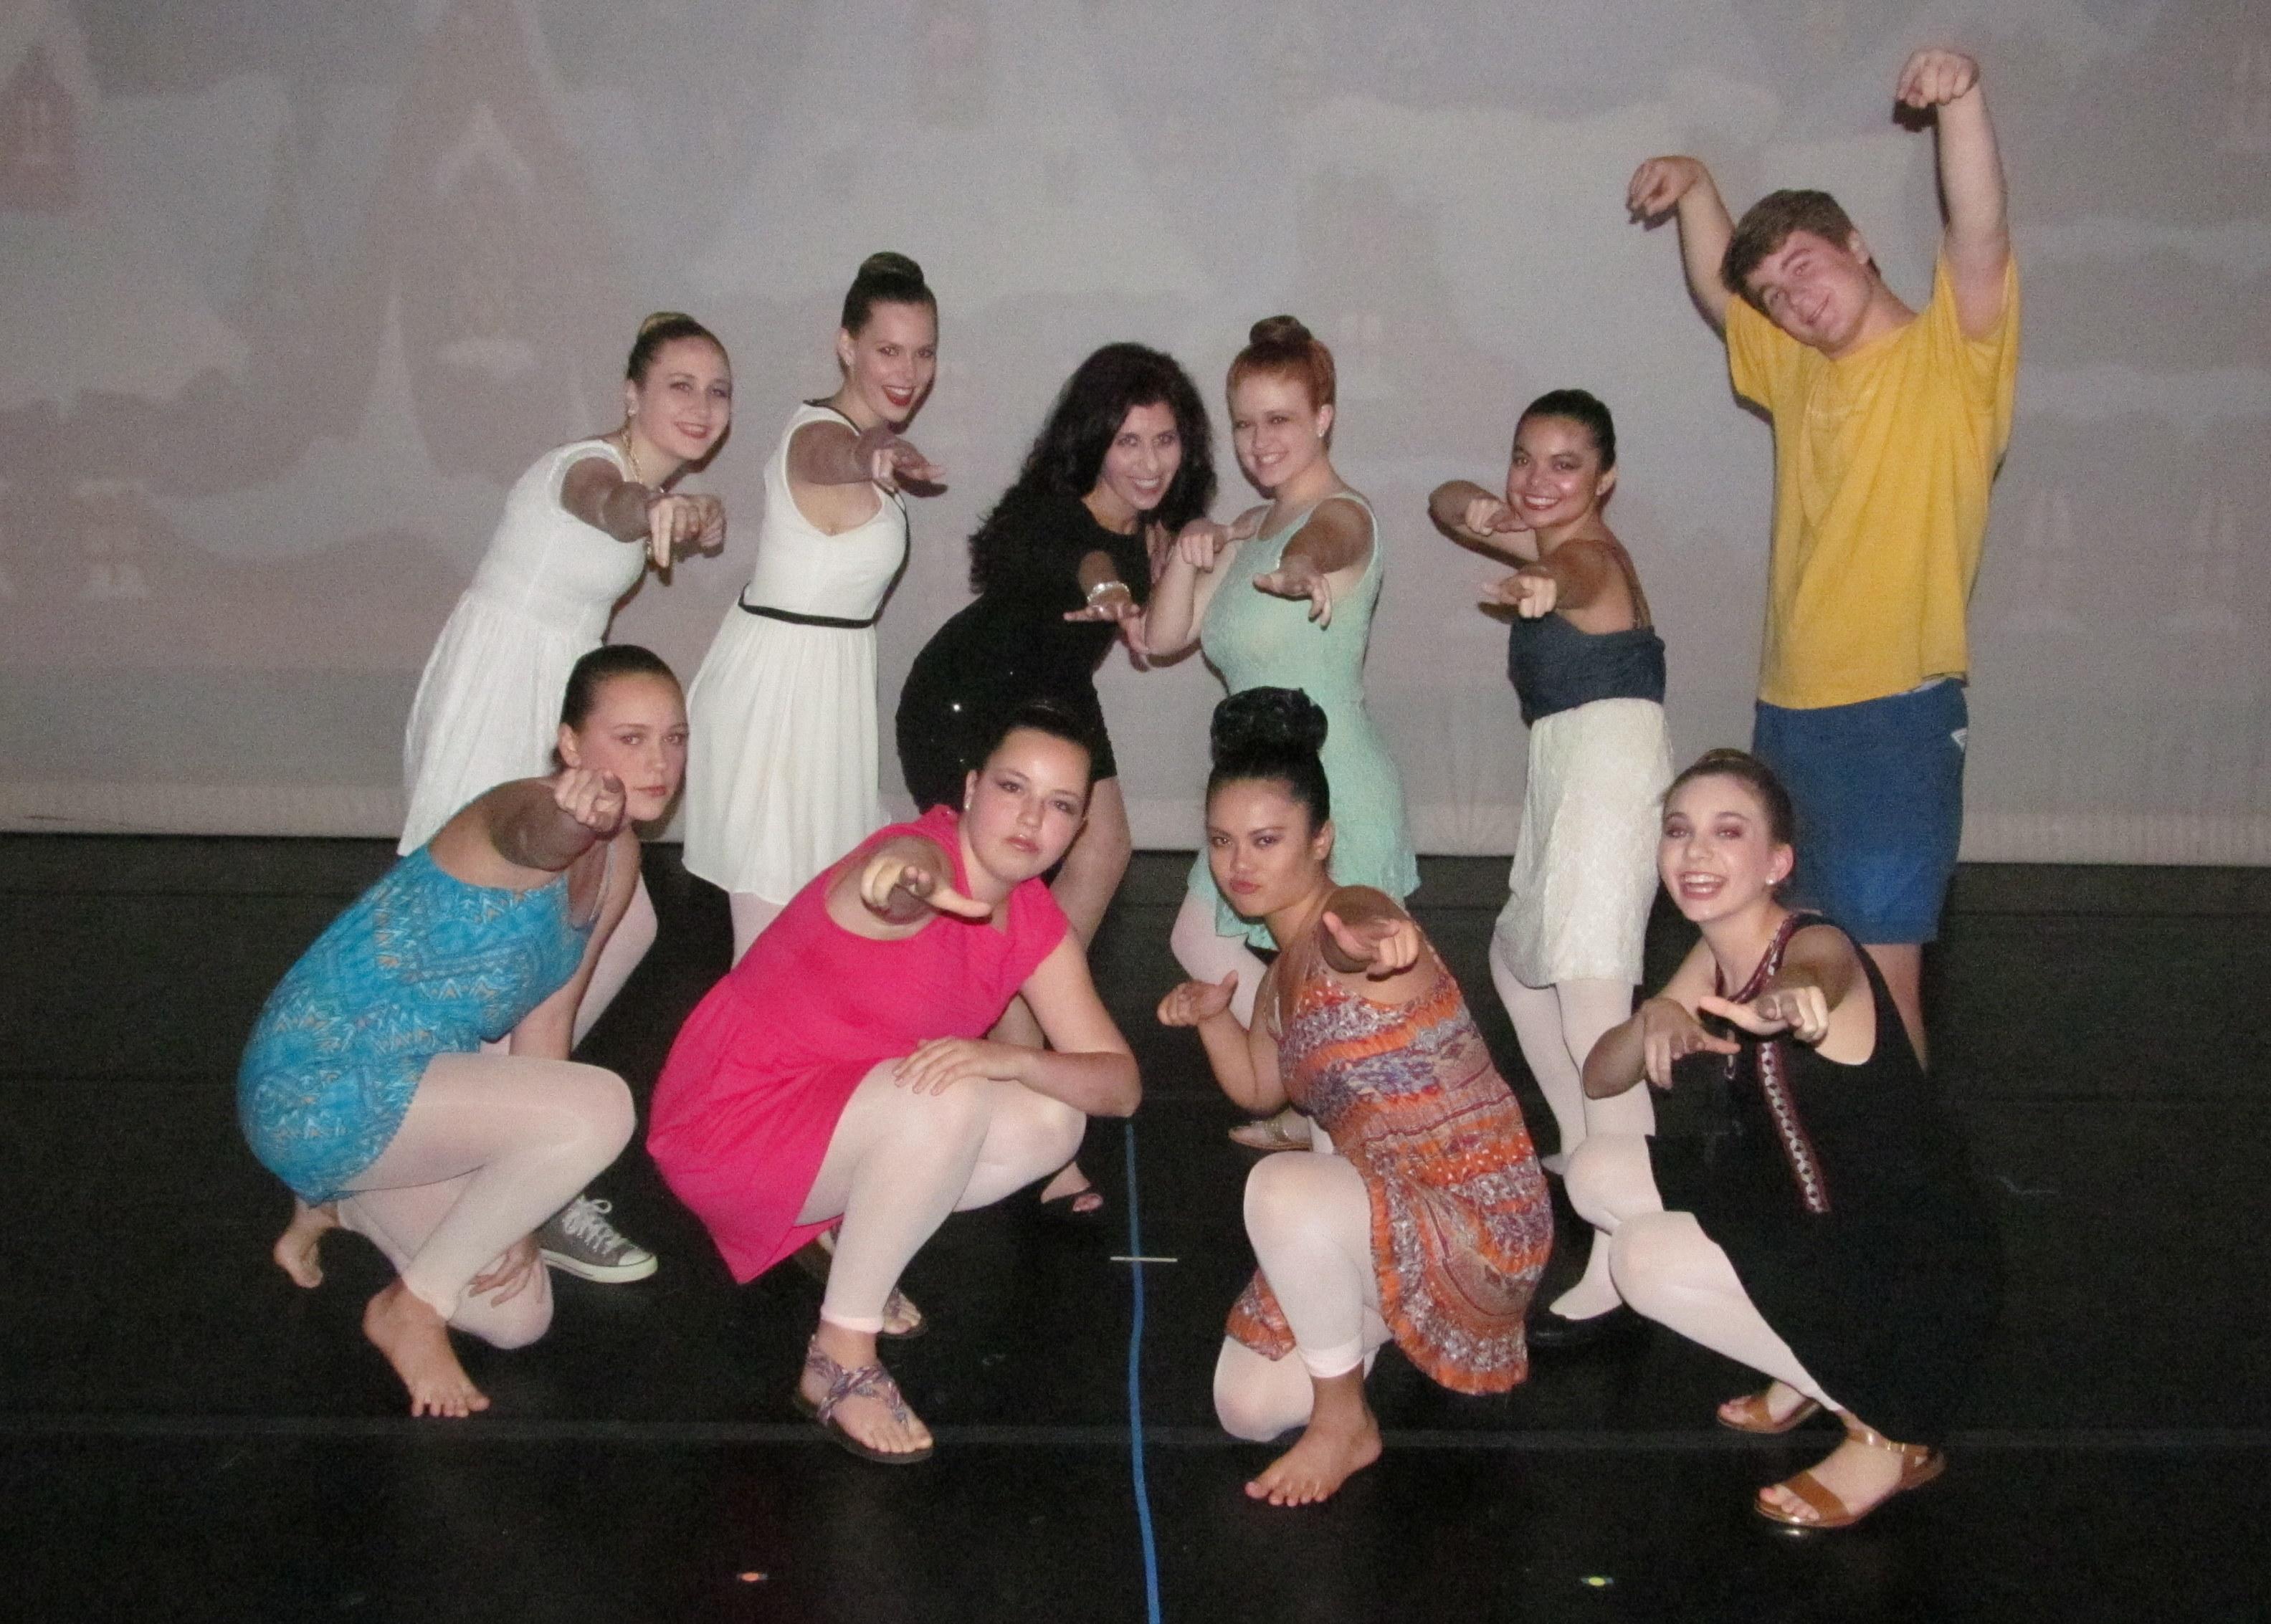 Christine s center stage dance studio home - Previous Next